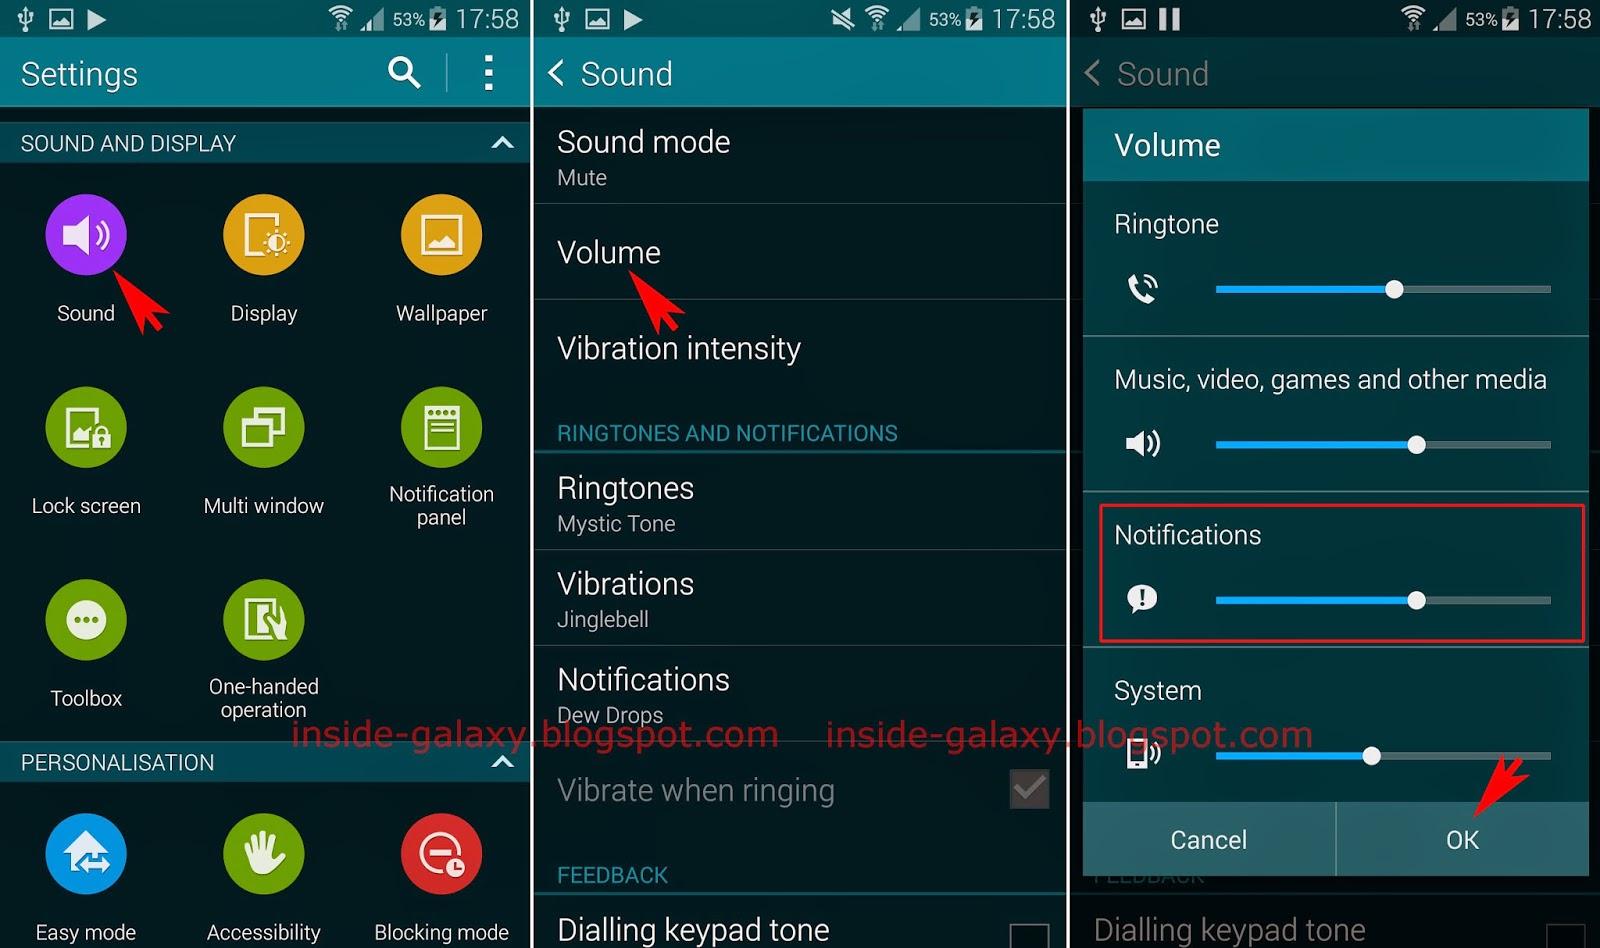 tinder app notifications